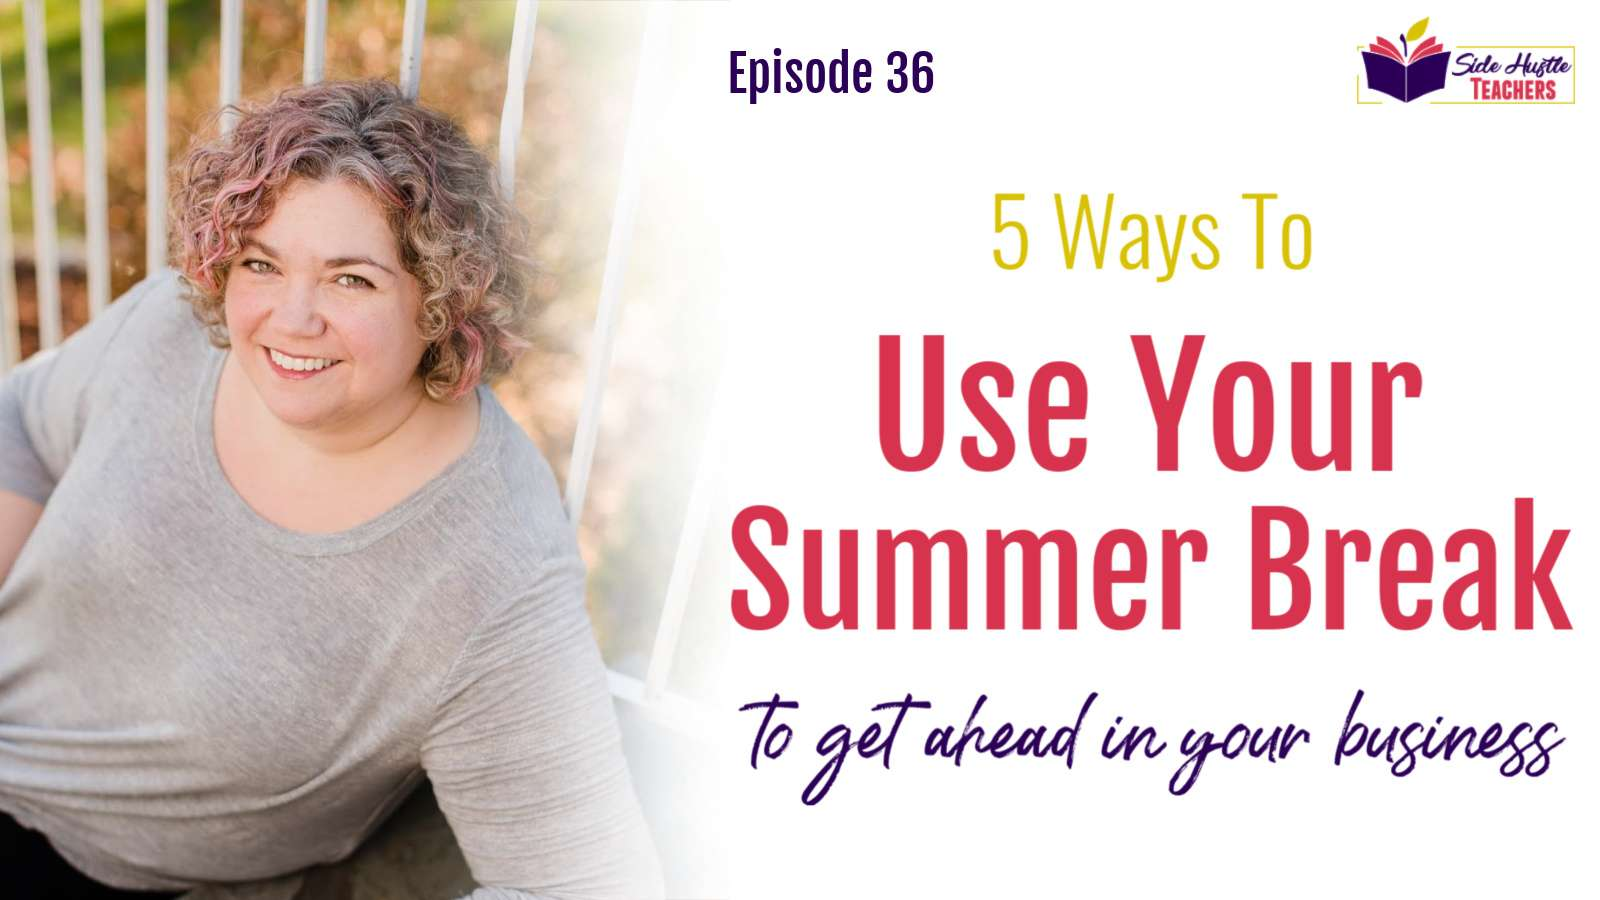 Here are 5 ways educators can use summer break to get ahead in their side hustles!